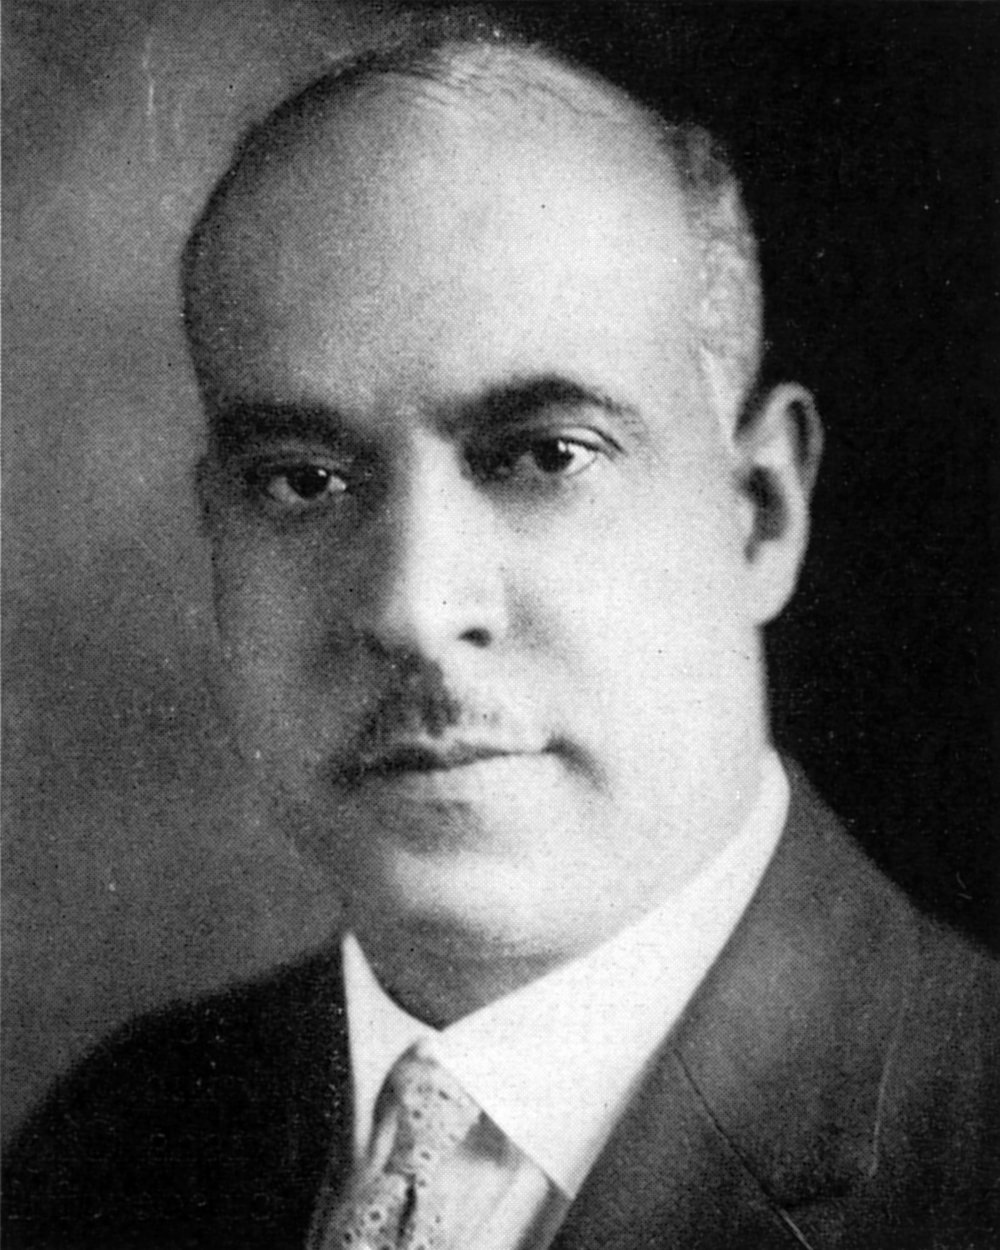 William J. Thompkins